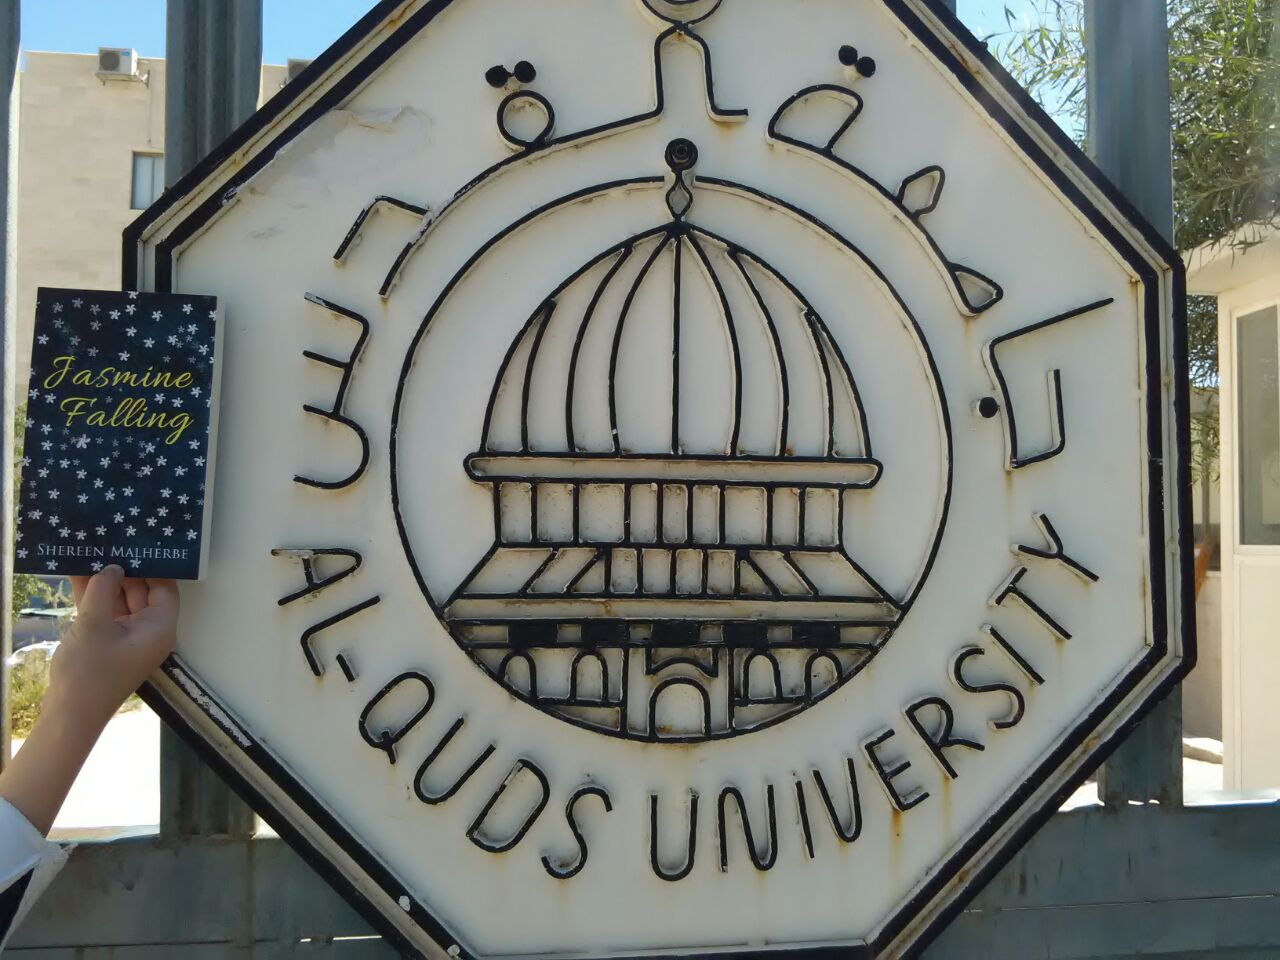 Jasmine Falling arrives at Universities in Palestine